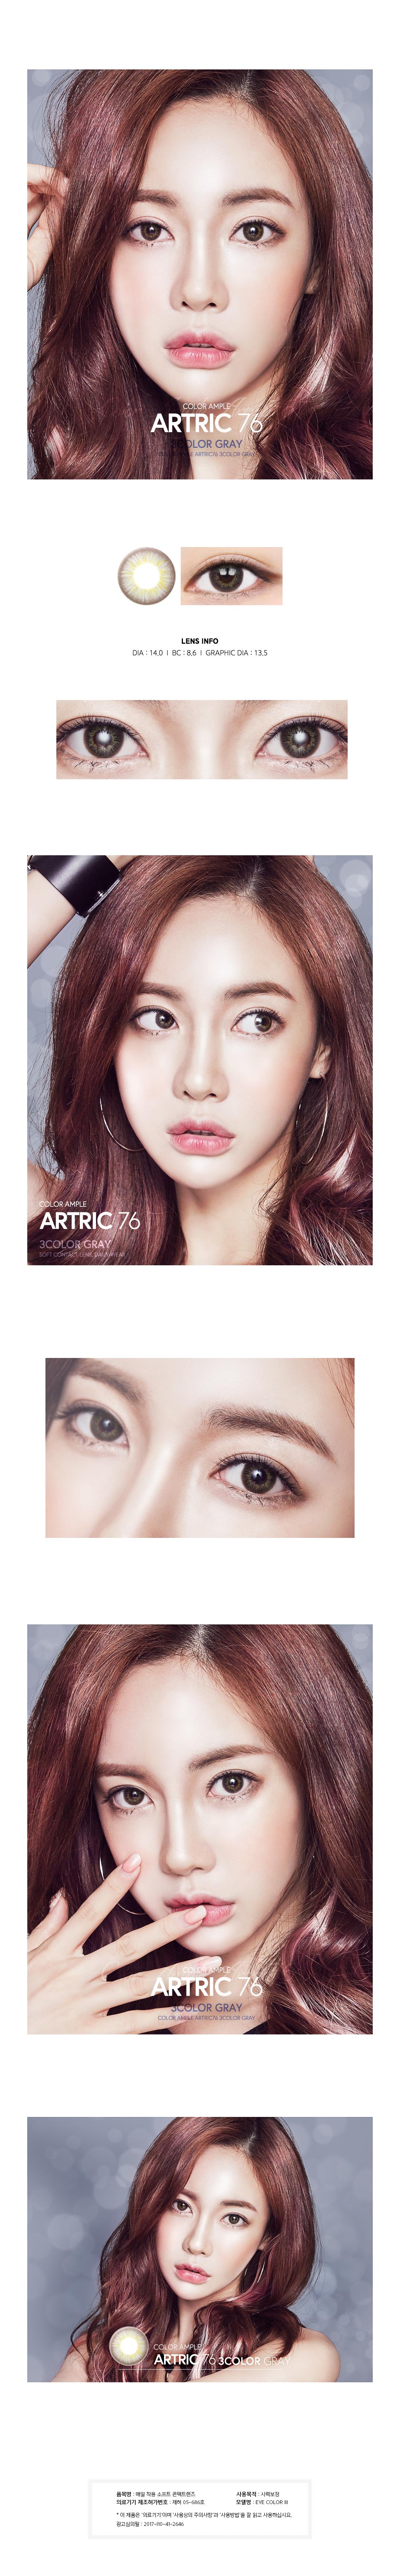 artric763colorgray.jpg